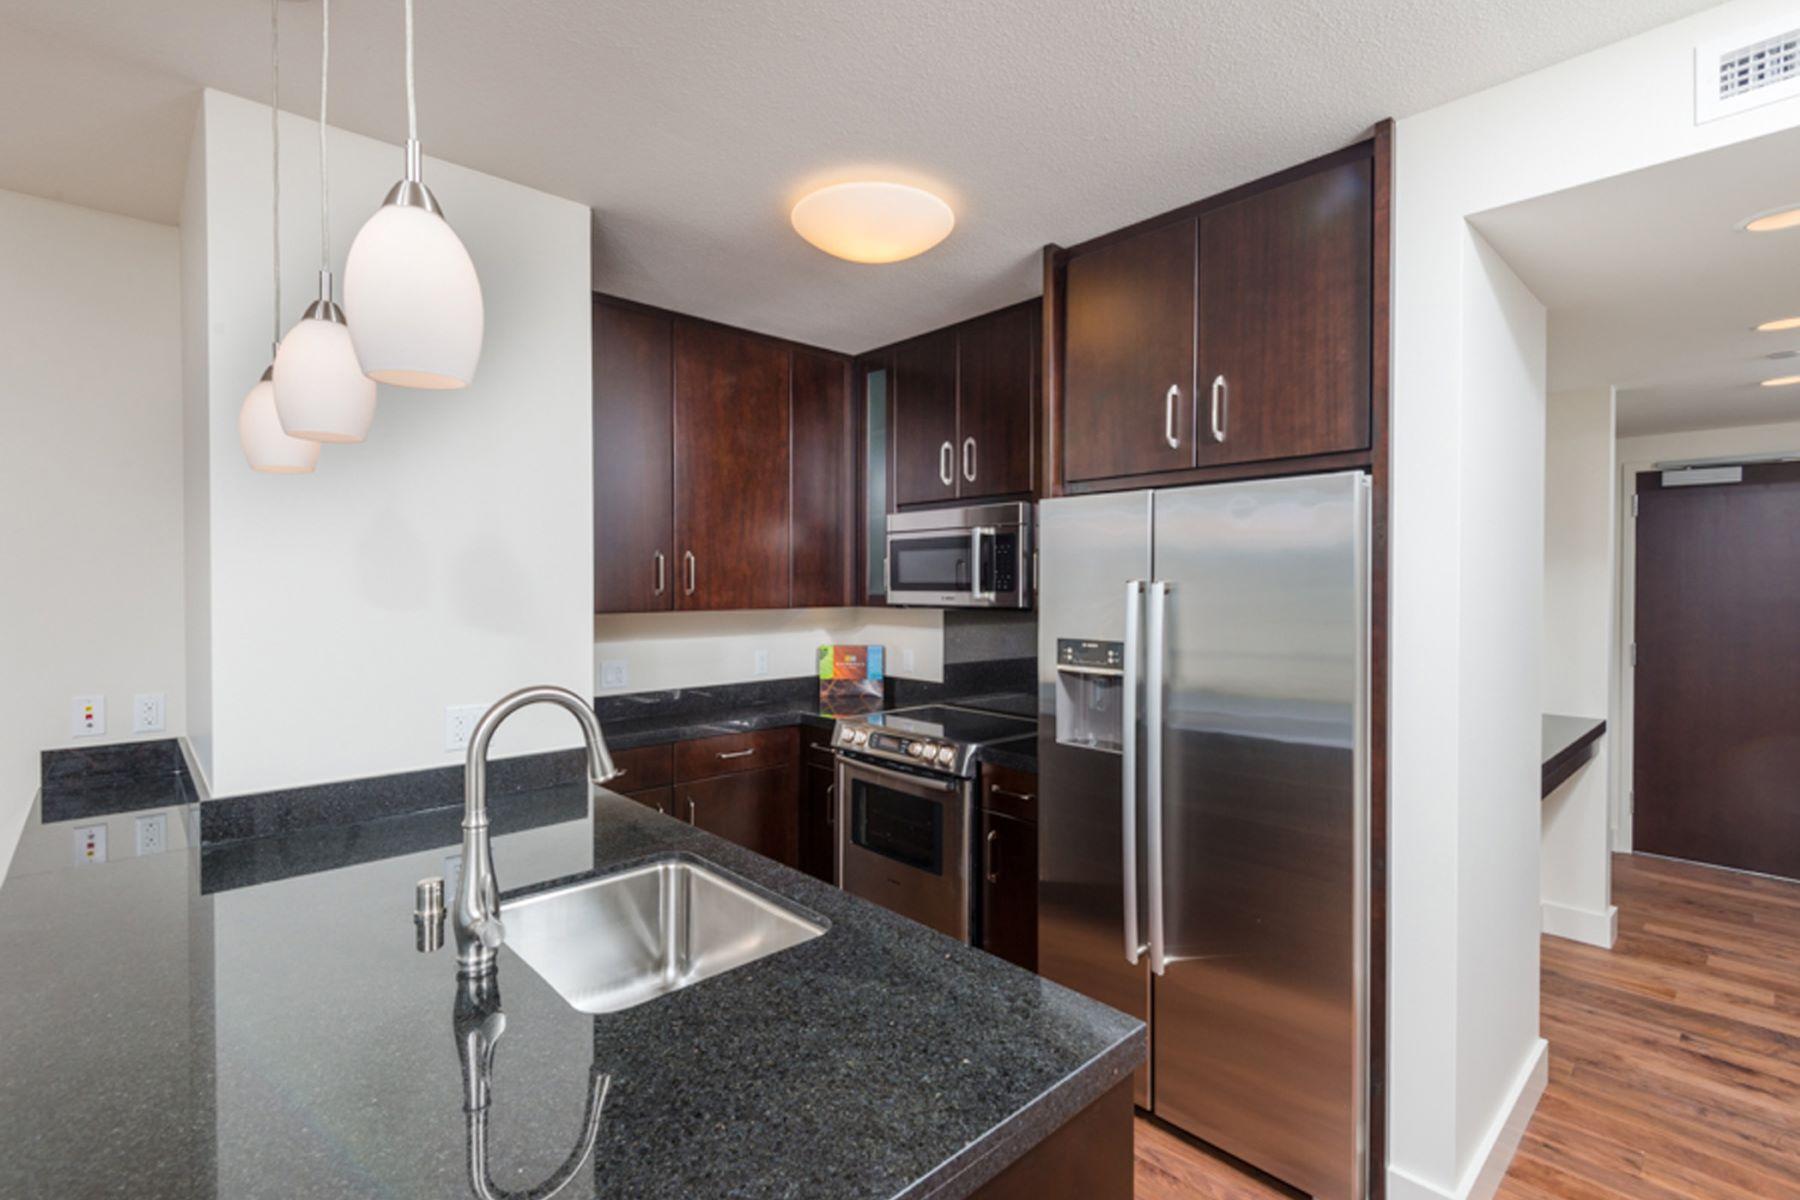 Condominium for Sale at Mountain Views Above Kakaako 1189 Waimanu Street #2907 Kakaako, Honolulu, Hawaii, 96814 United States